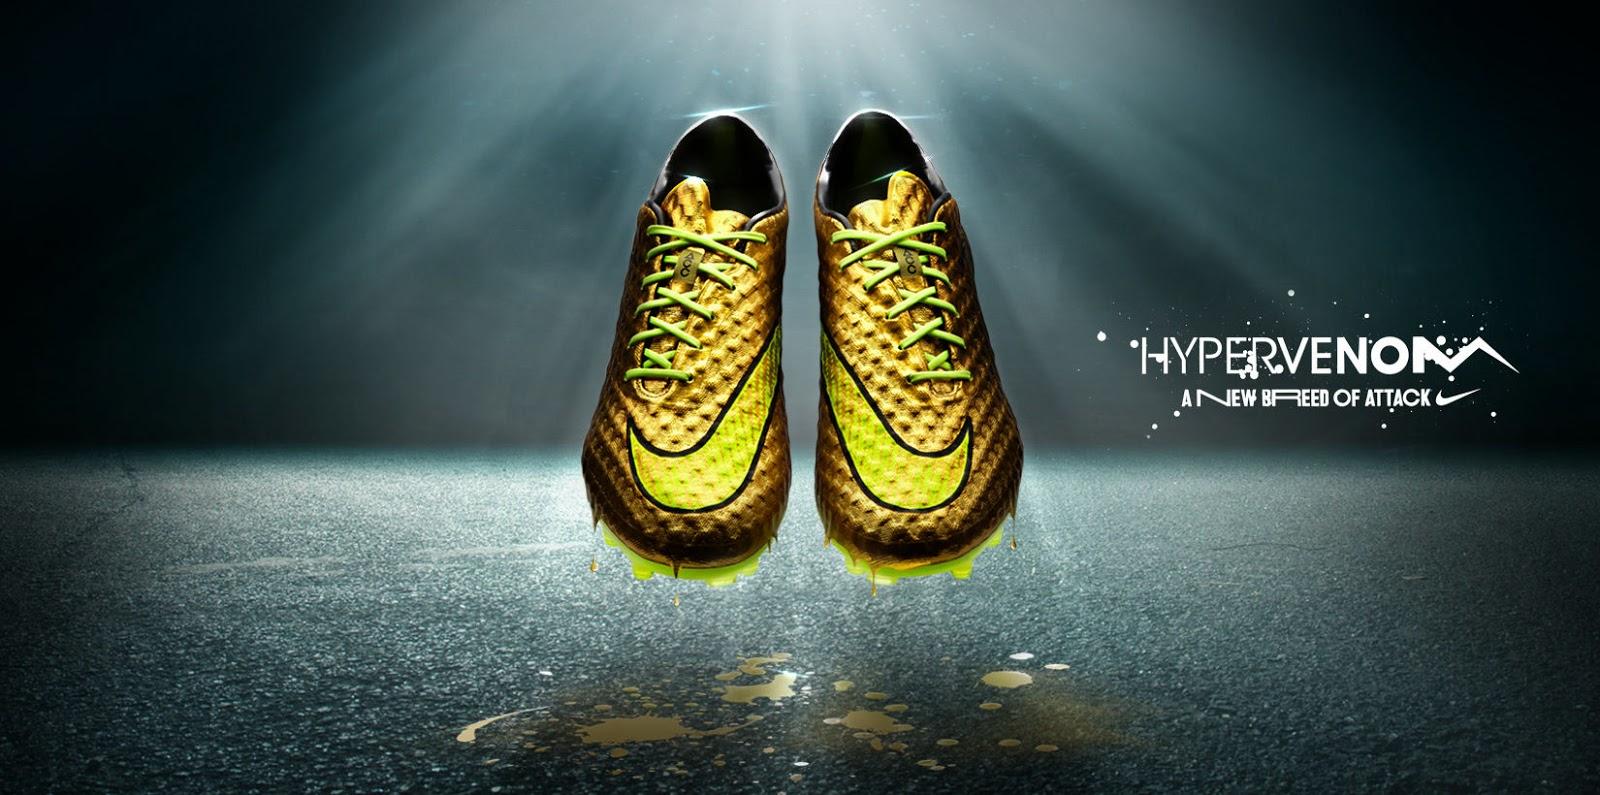 gold neymar 2014 world cup hypervenom boot unveiled